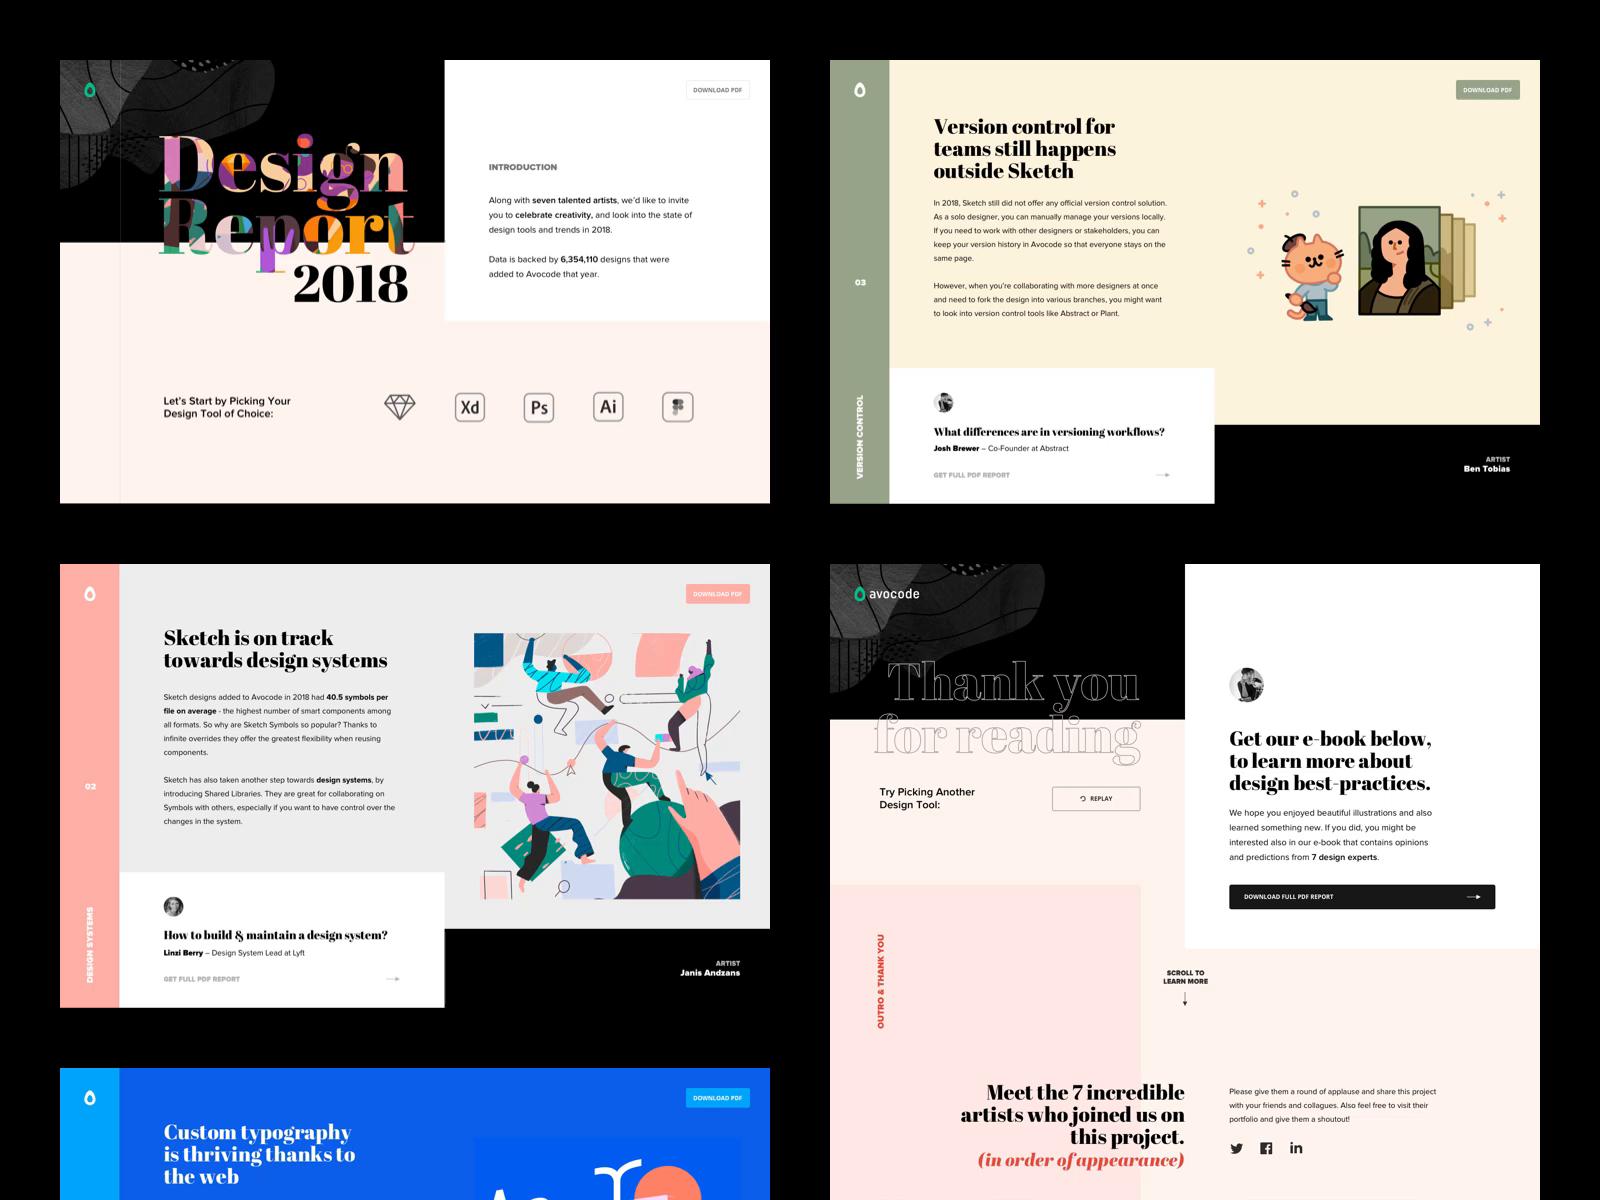 Design Report 2018 Web By Jan Vu Nam Dribbble Dribbble Business Website Design Web Design Creative Website Design